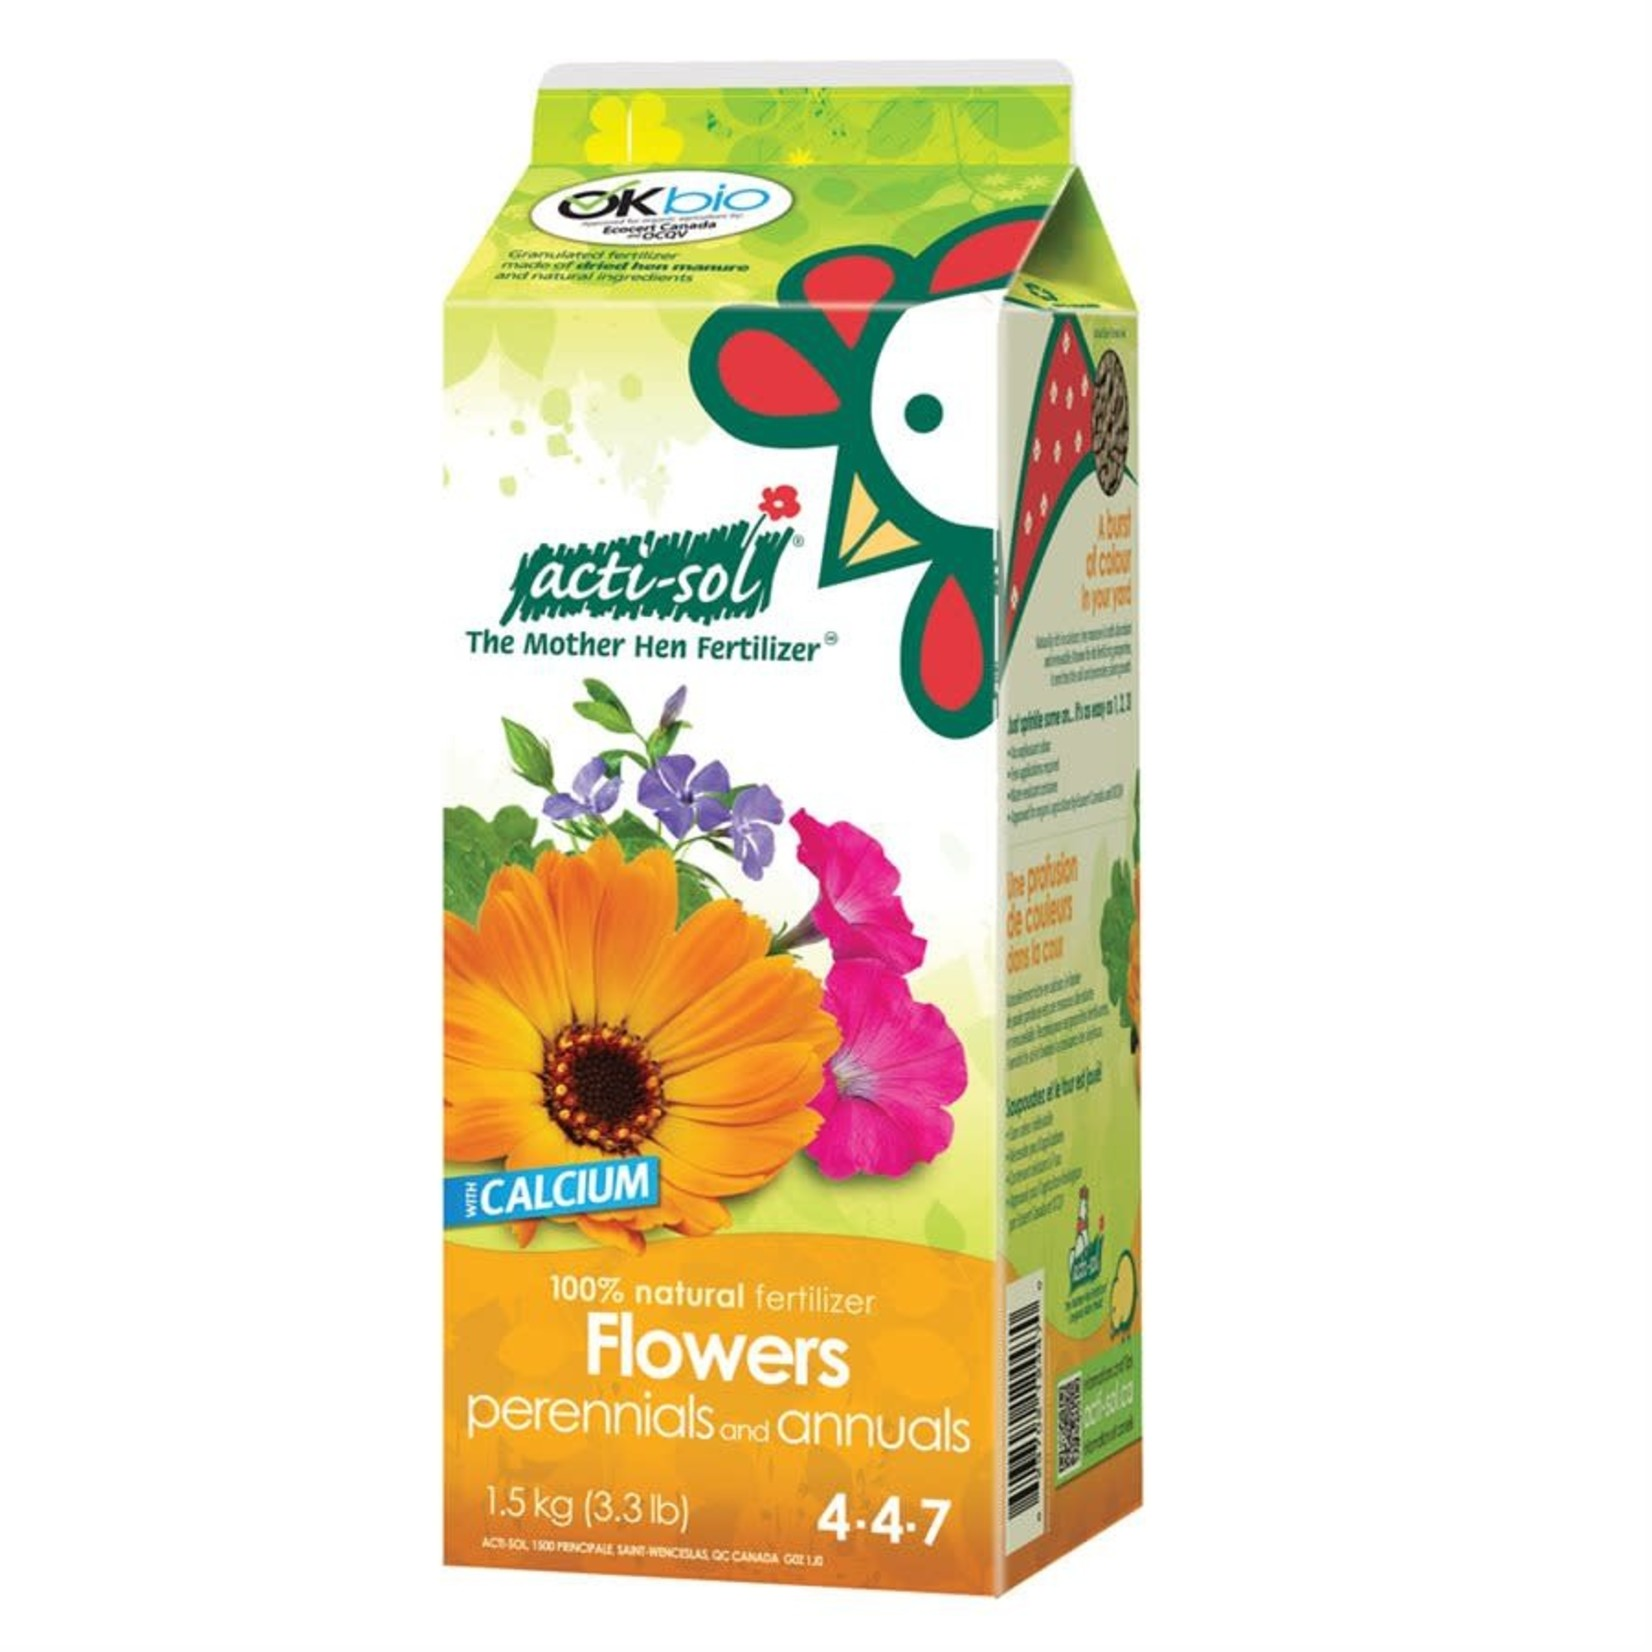 Acti-Sol Flowers 4-4-7 1.5kg